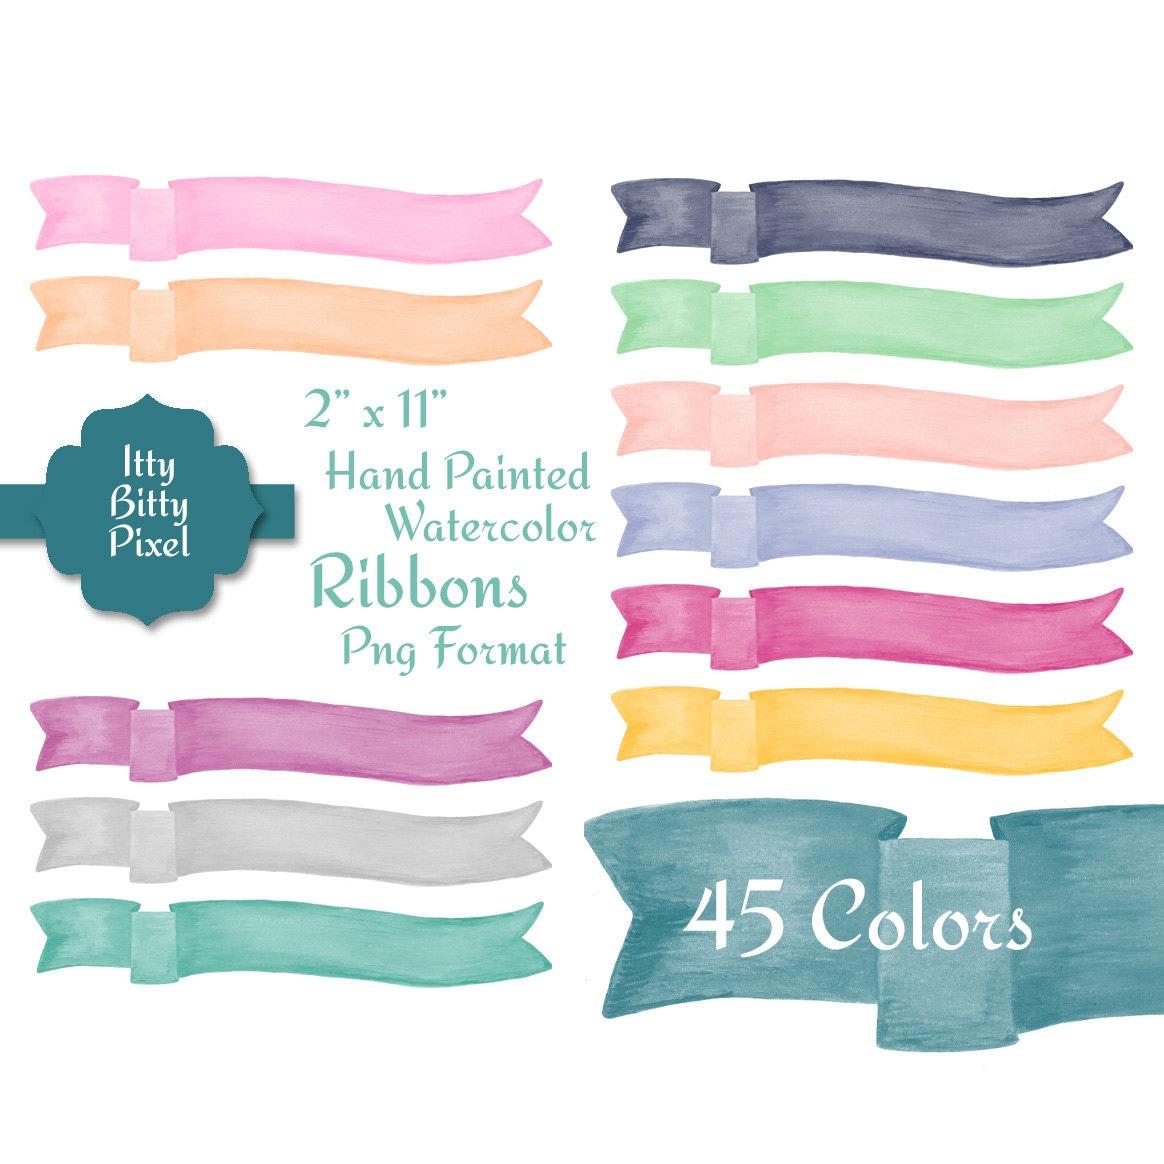 Watercolor Ribbon Clip Art Banner Hand Painted Digital